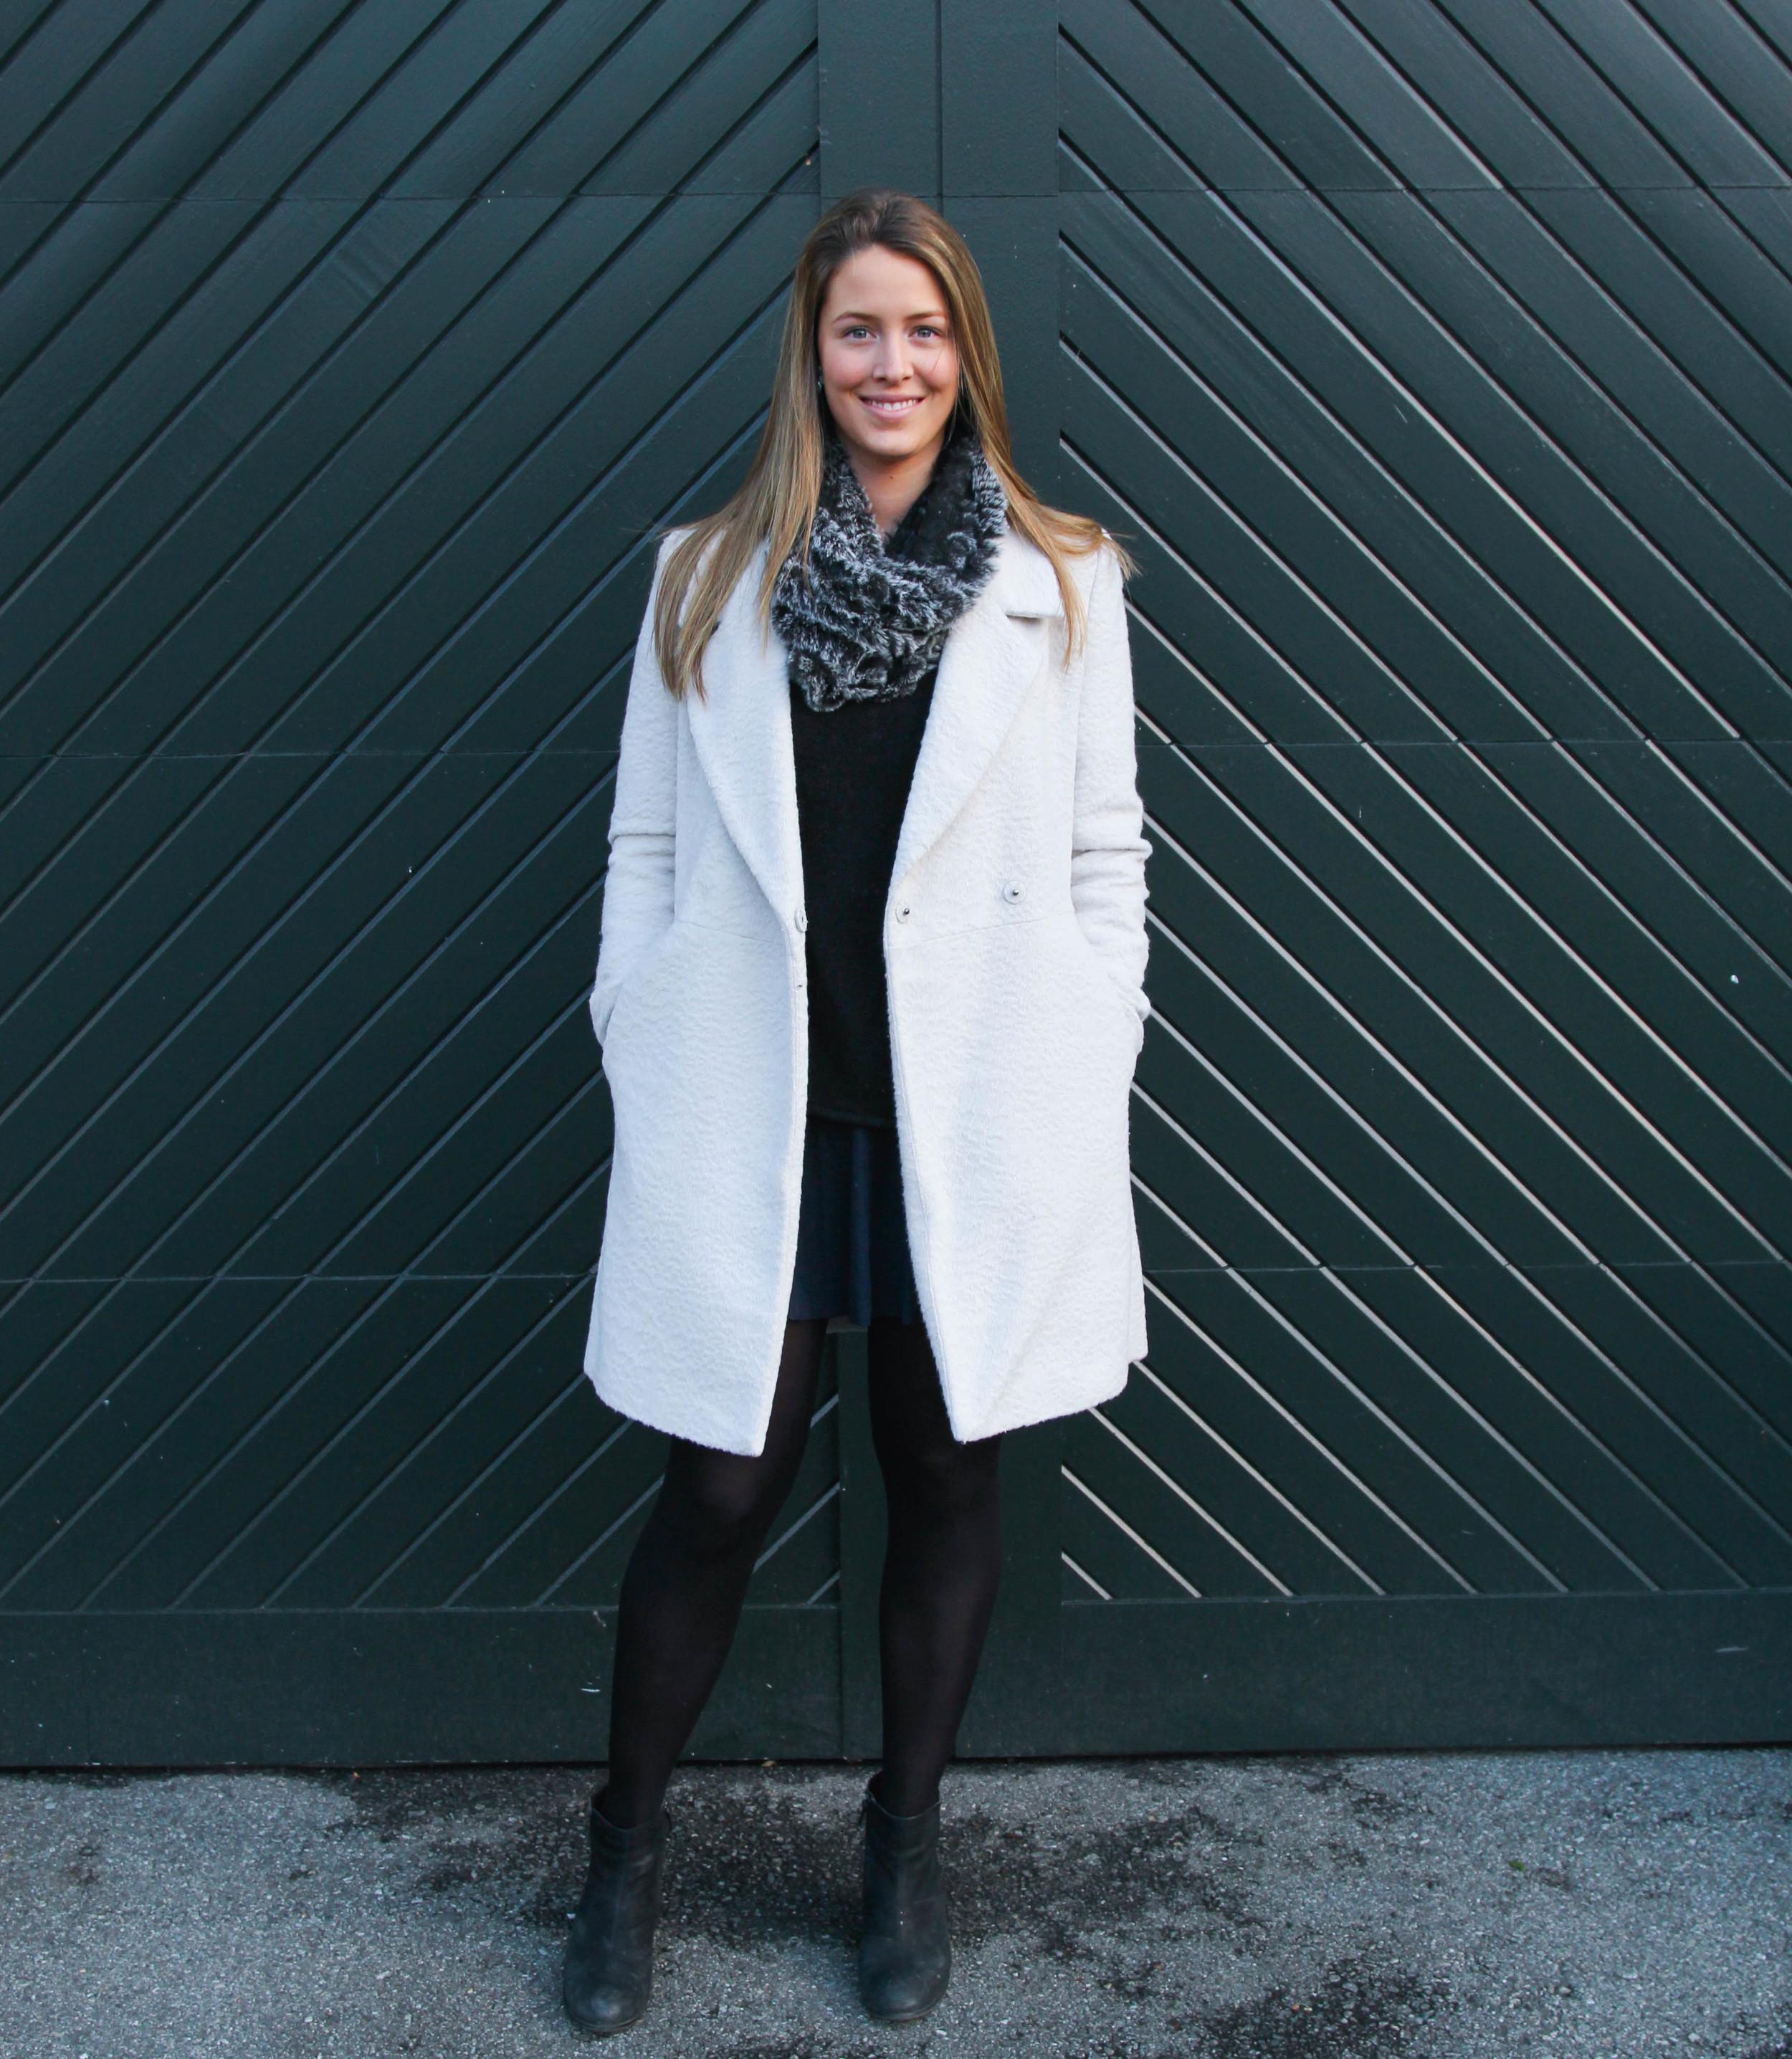 H&M sweater (  similar  ), Theory Skirt (  similar  ,  similar  )  Tahari Jacket (  similar  ,  similar  )  , HUE tights,  Bata booties  (  similar  ),  Saks Fifth Ave scarf  ,  Heidi Weddendorf  pearl earrings.